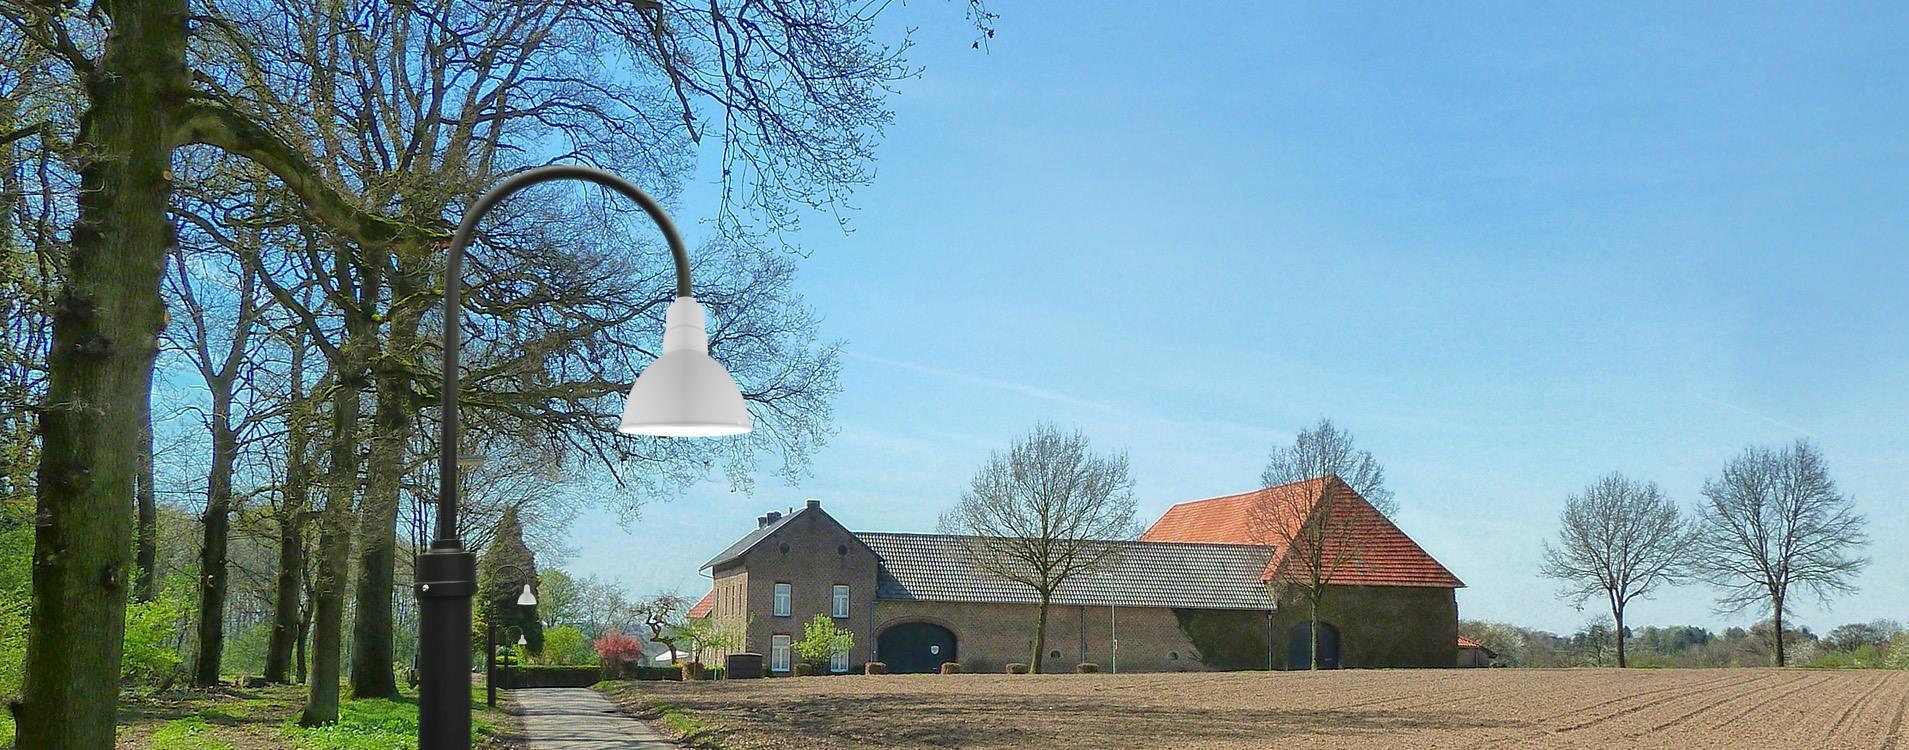 Customizable Blackspot LED Barn Lamp Post weatherproof